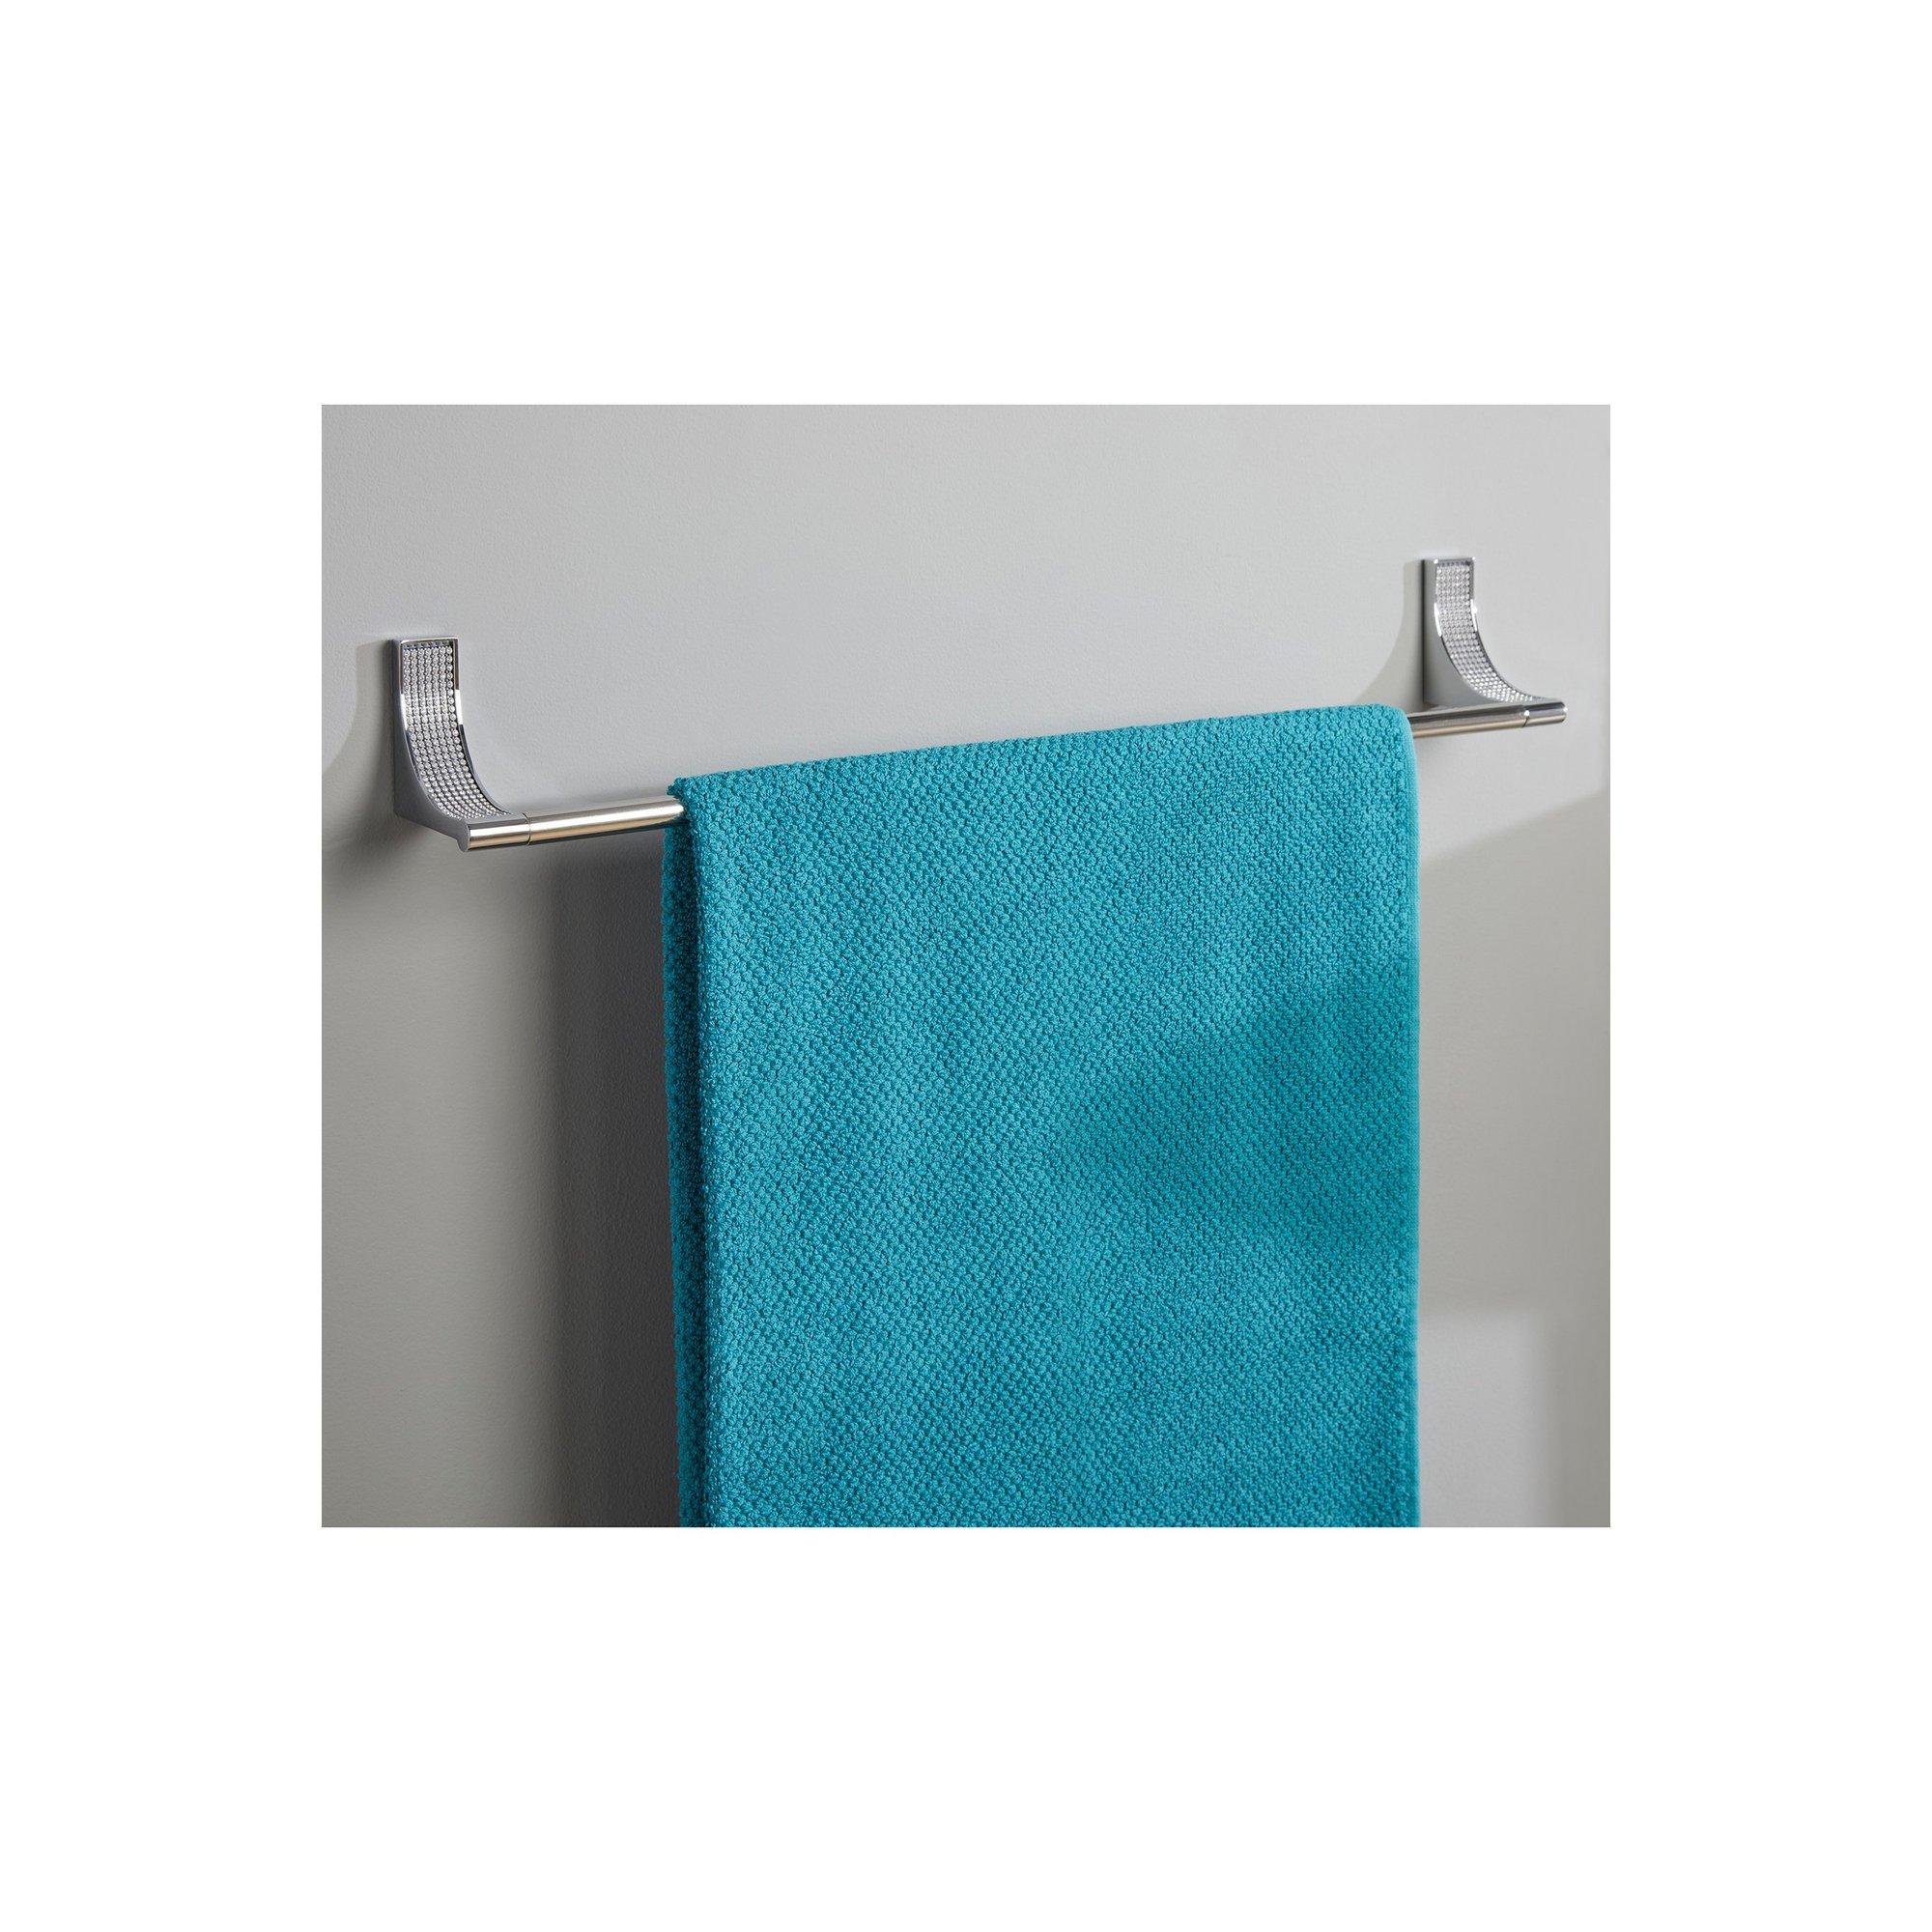 Image of Glamour Square Bathroom Towel Rail